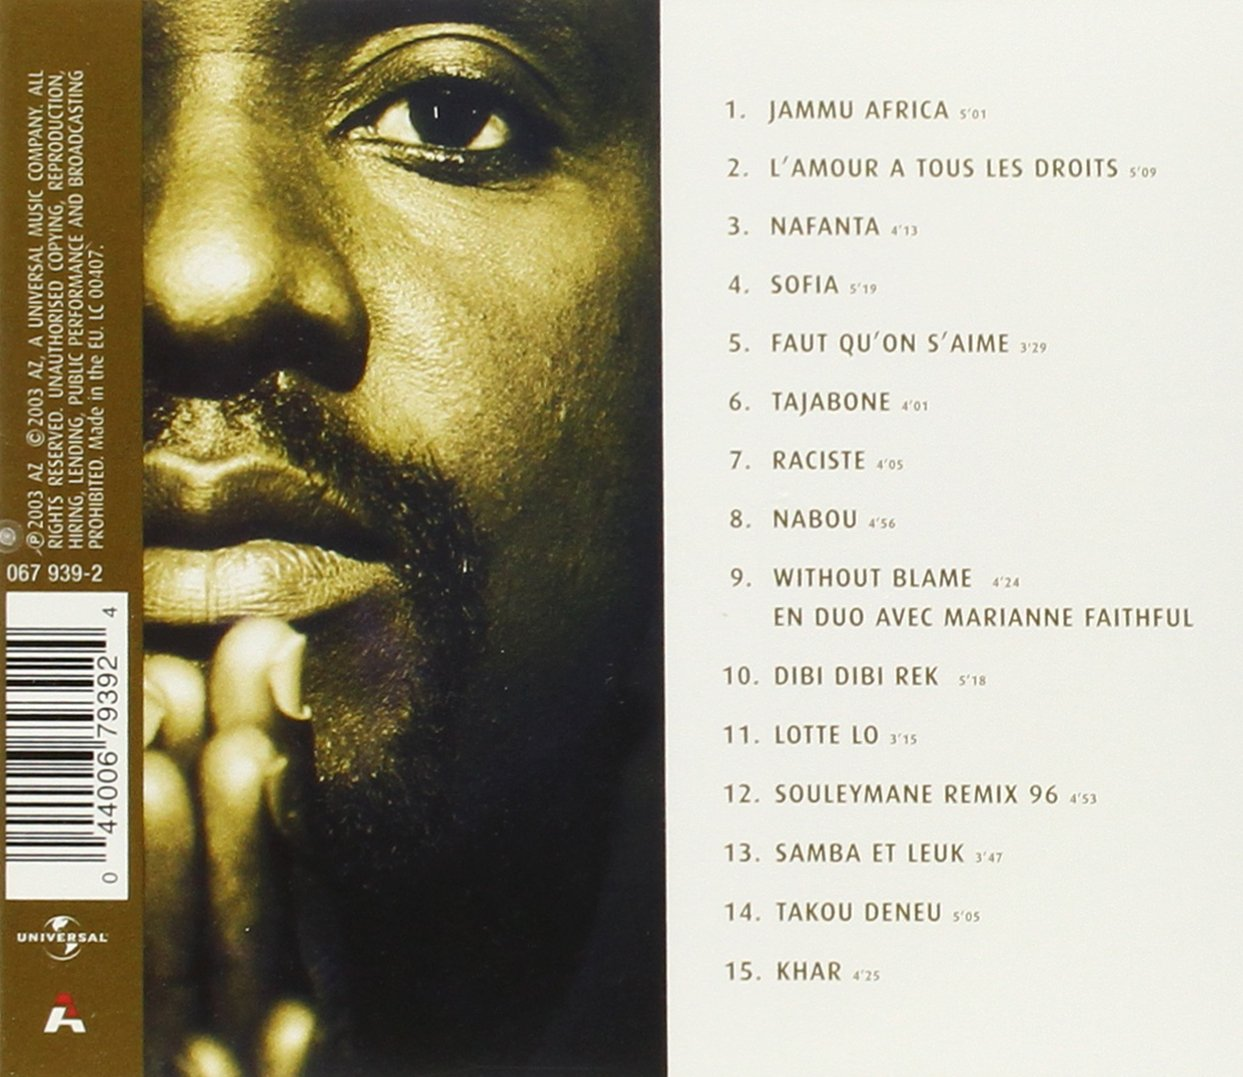 MP3 LO JAMMU TÉLÉCHARGER ISMAEL GRATUIT AFRICA